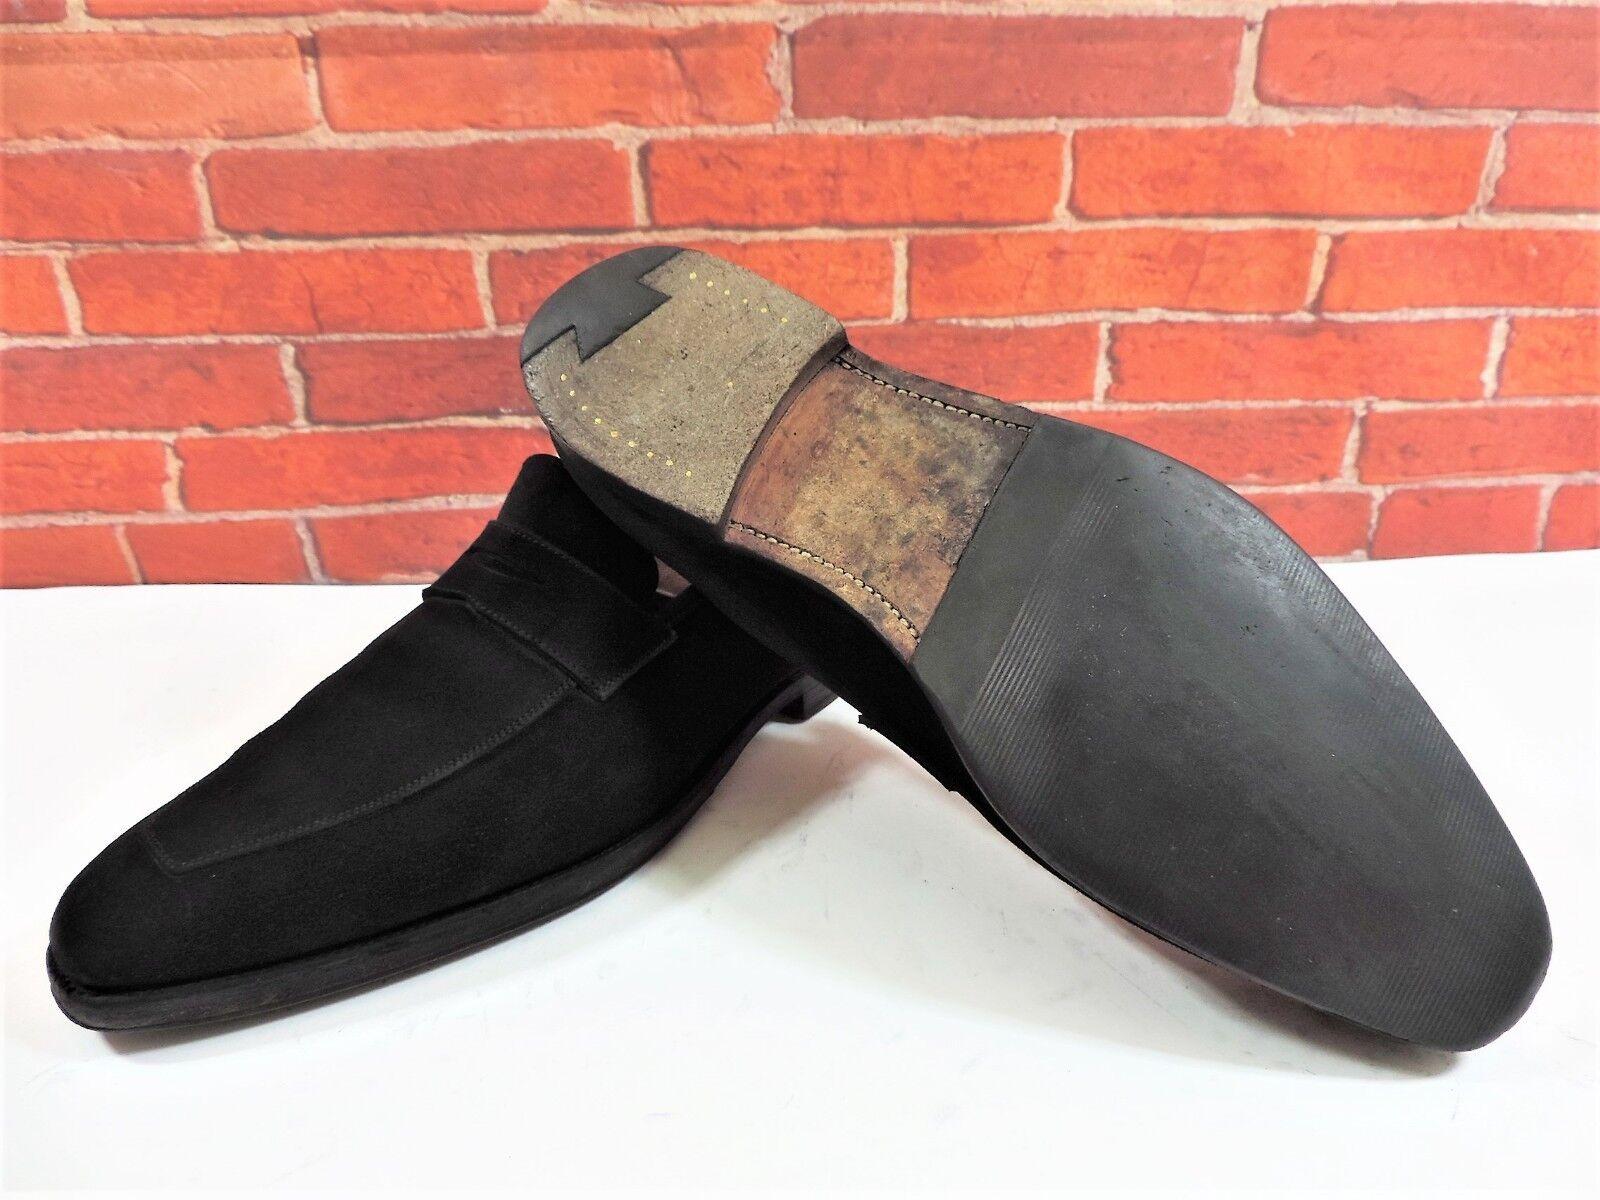 Crockett & Jones Suede Penny Loafers UK 8.5 US 9.5 9.5 9.5 EU 42.5 Glove Soft Suede 2ea55e